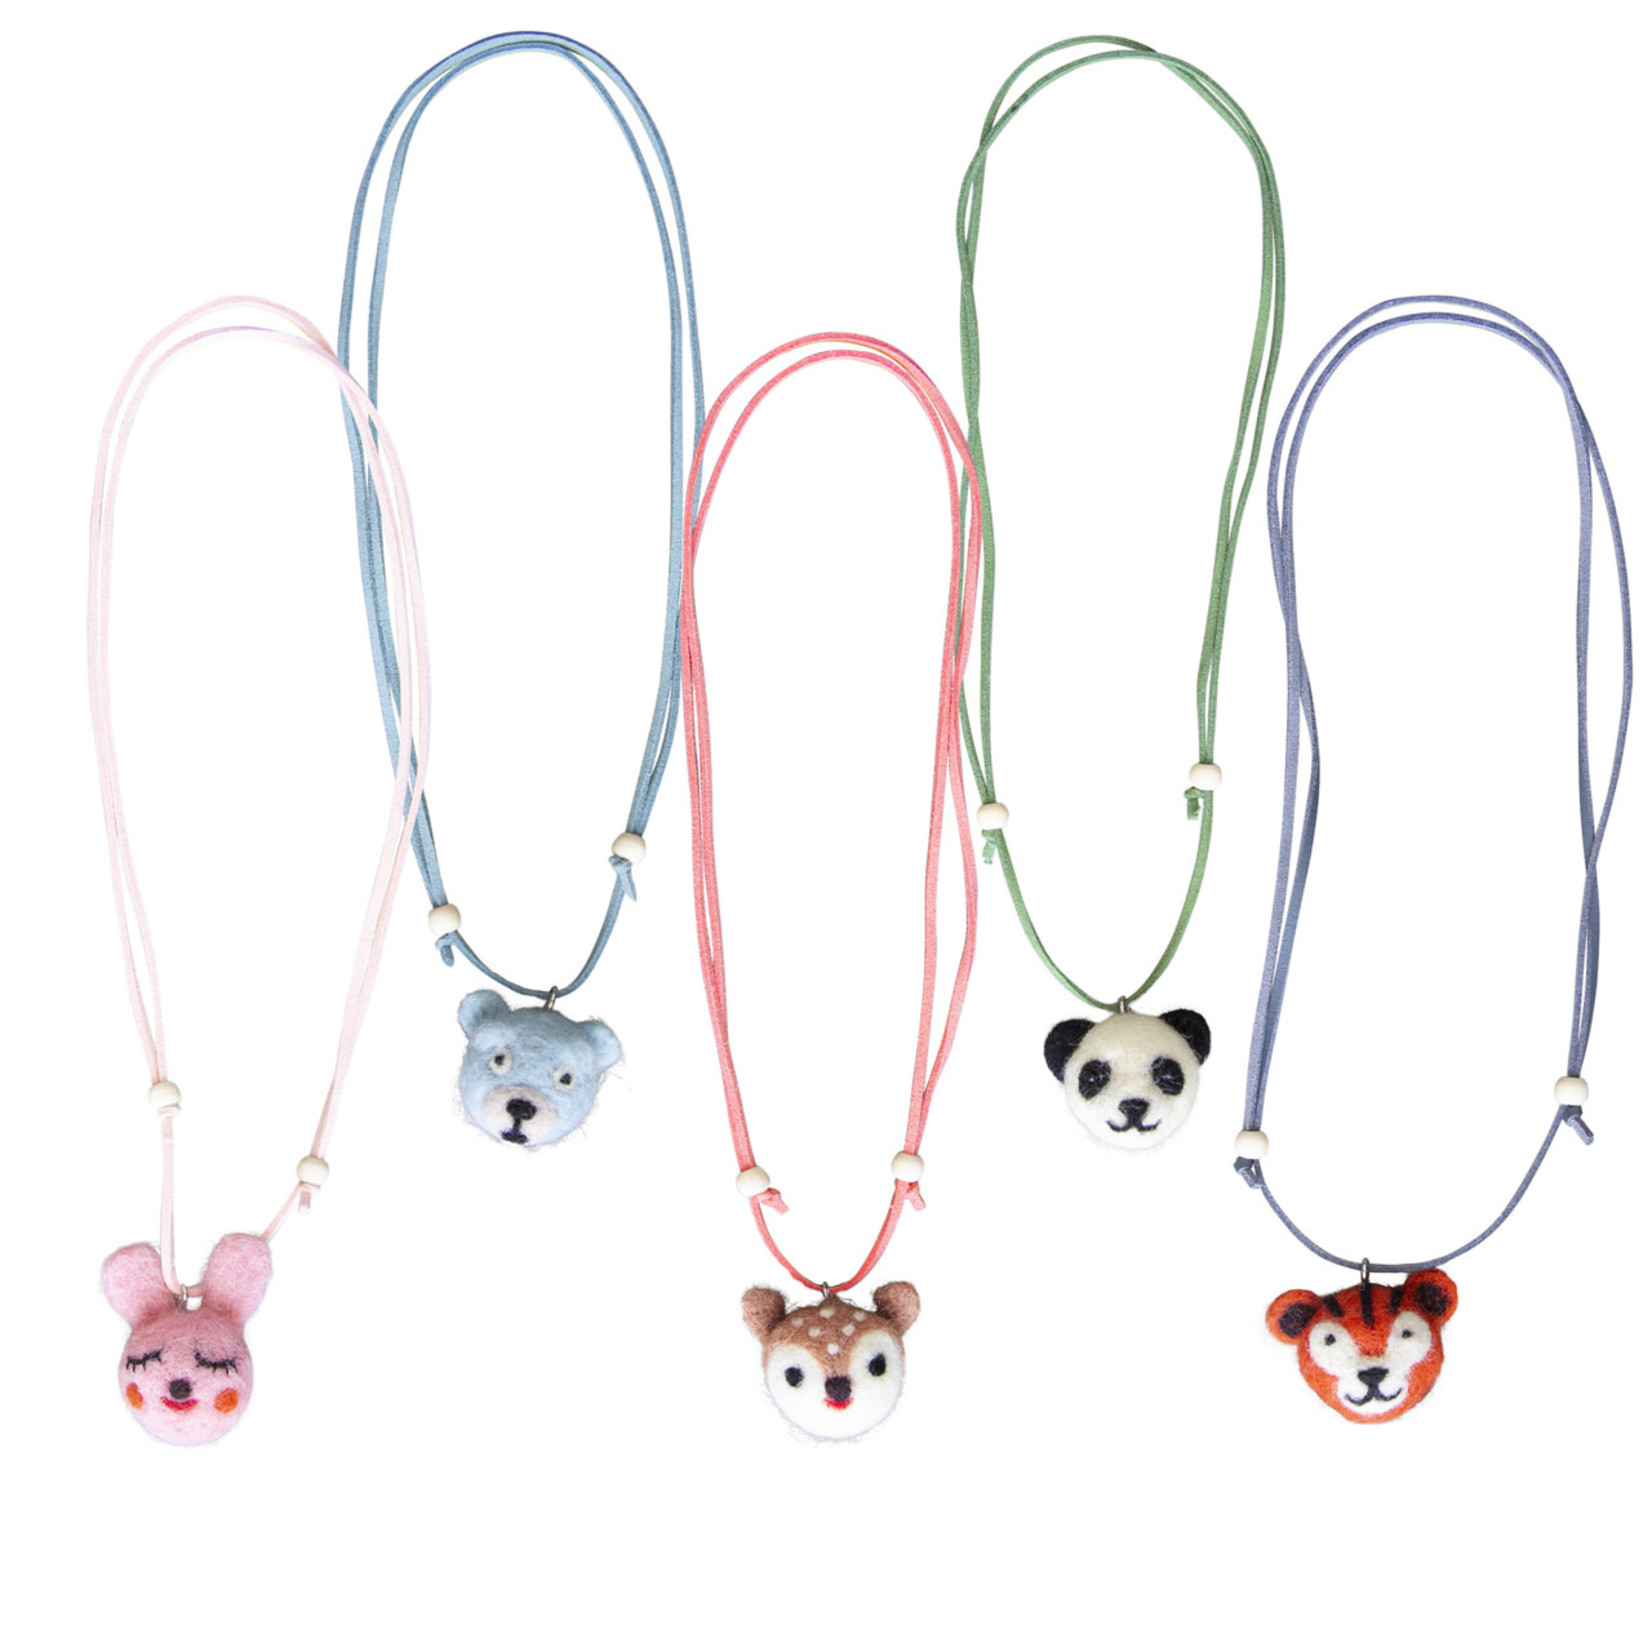 GLOBAL AFFAIRS GLOBAL AFFAIRS necklace bunny